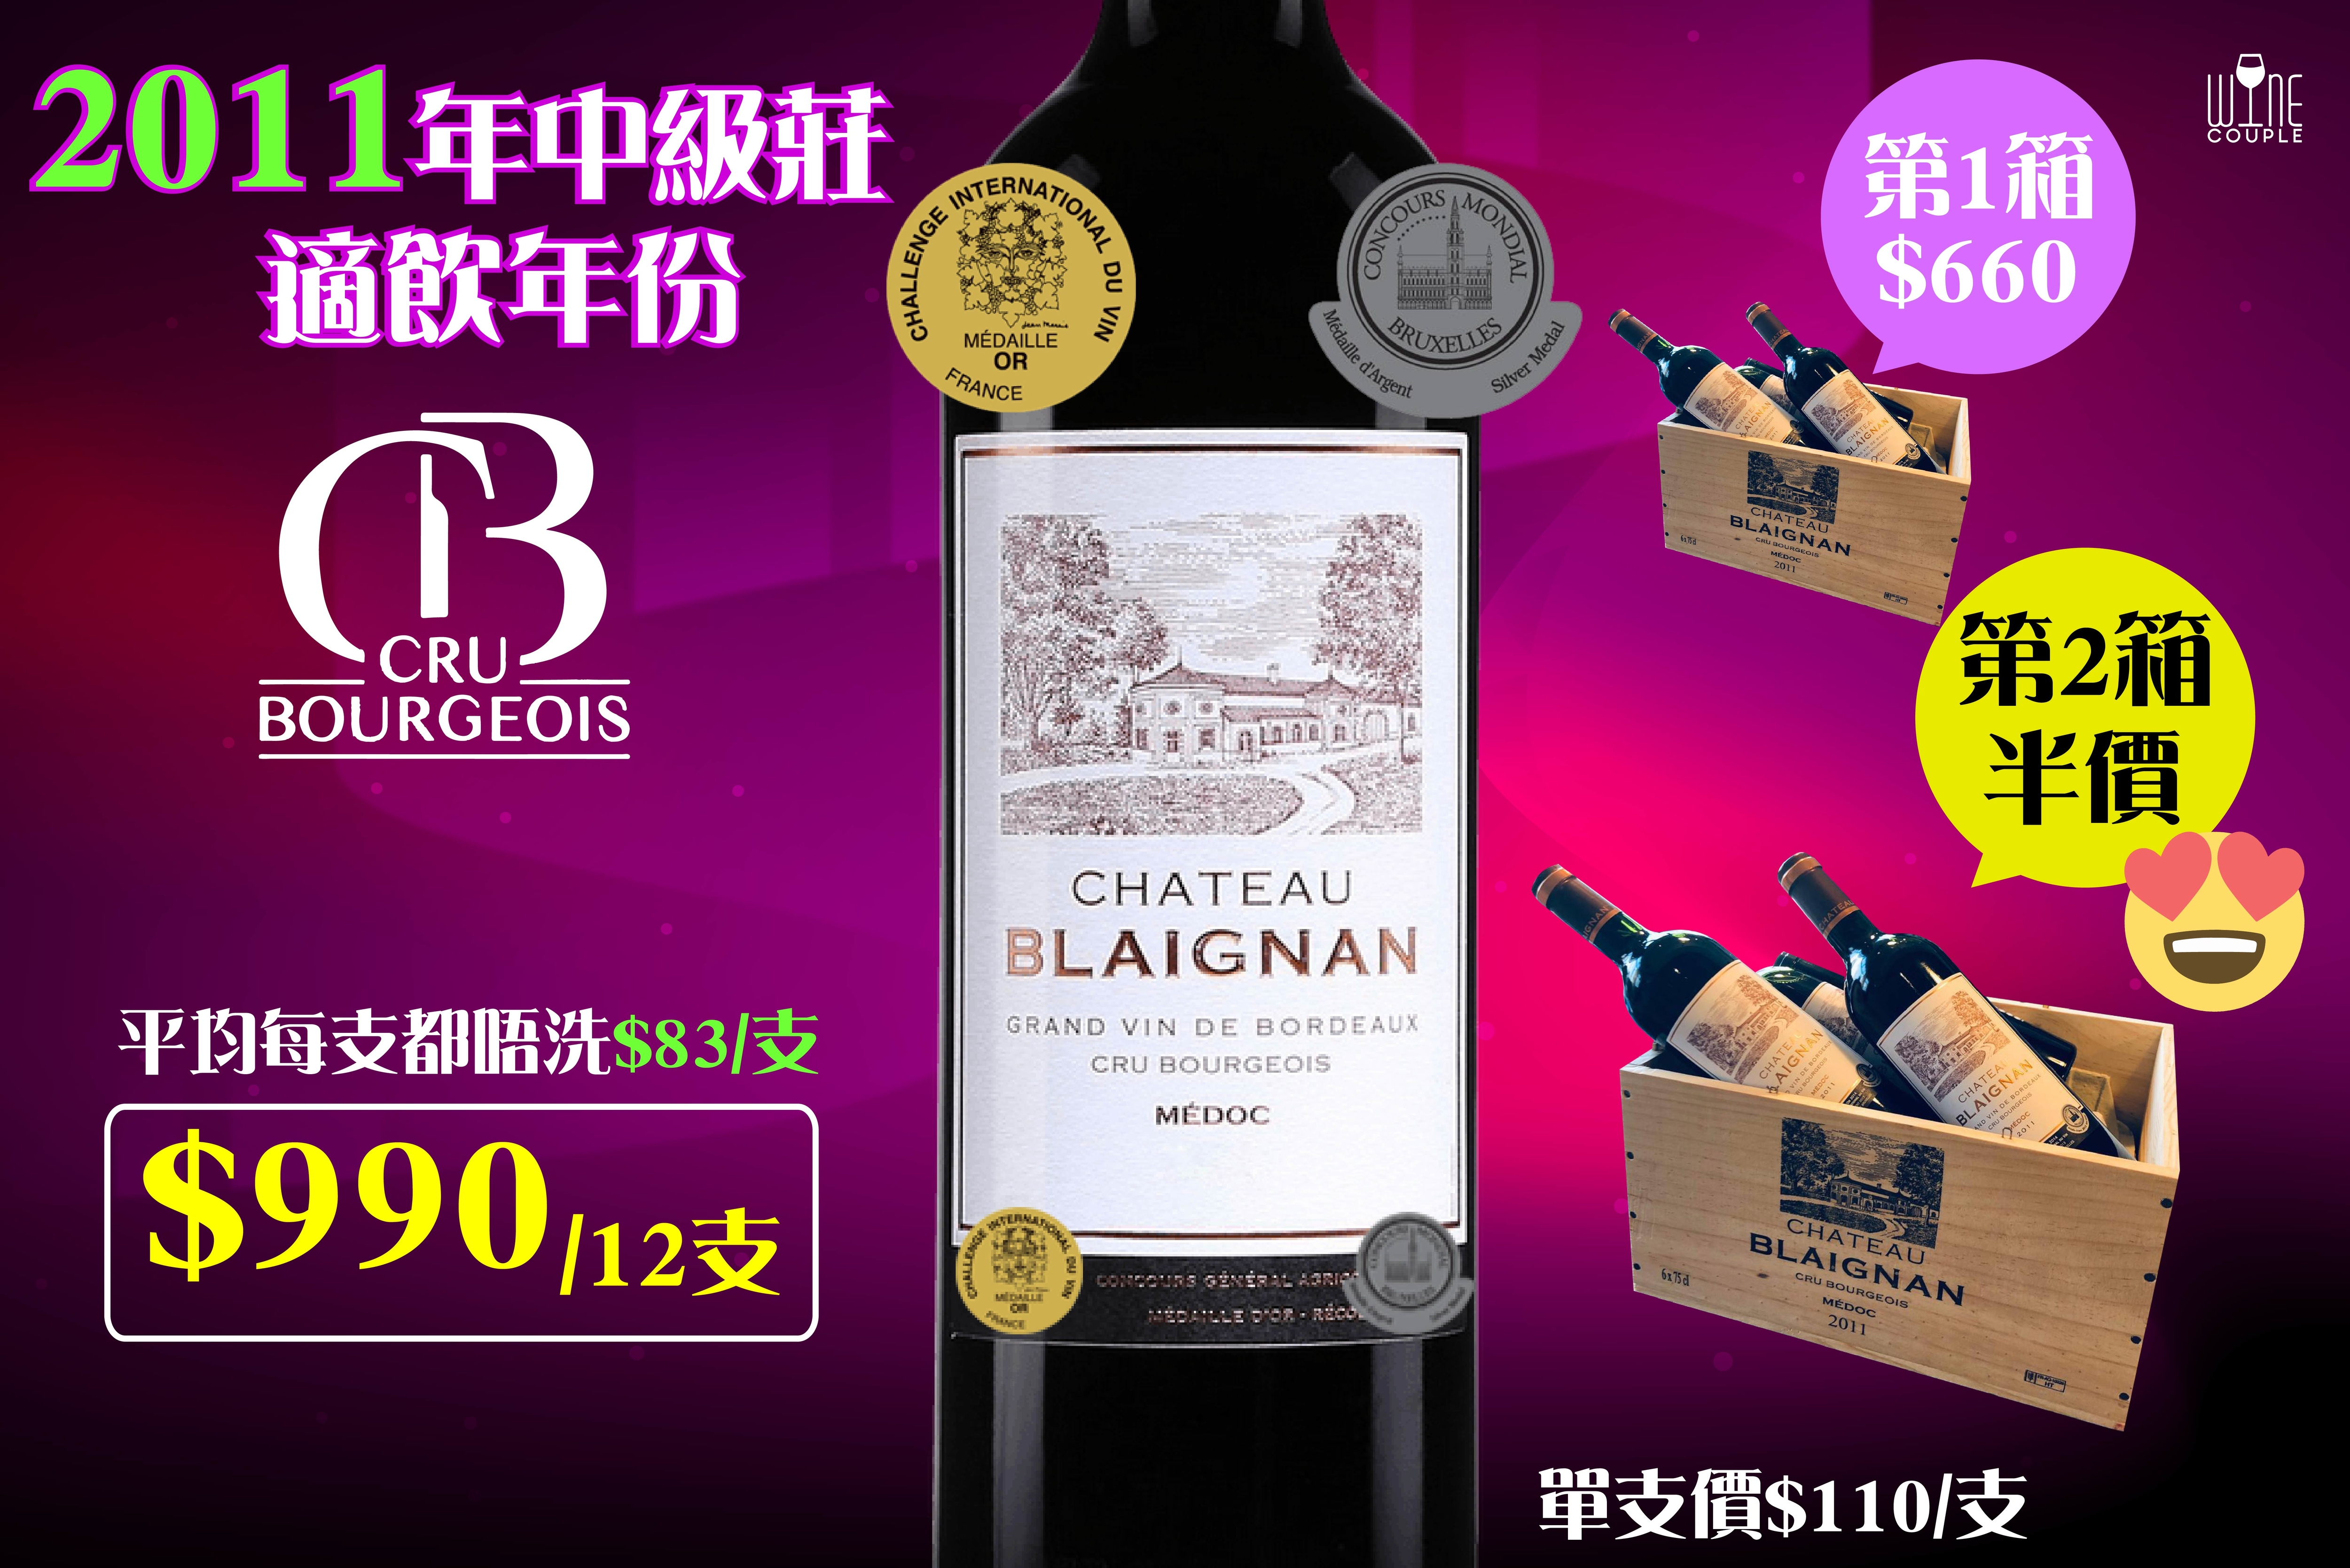 Chateau Blaignan,Medoc Cru Bourgeois,碧朗酒莊,中級莊 Cru Bourgeois,Medaille